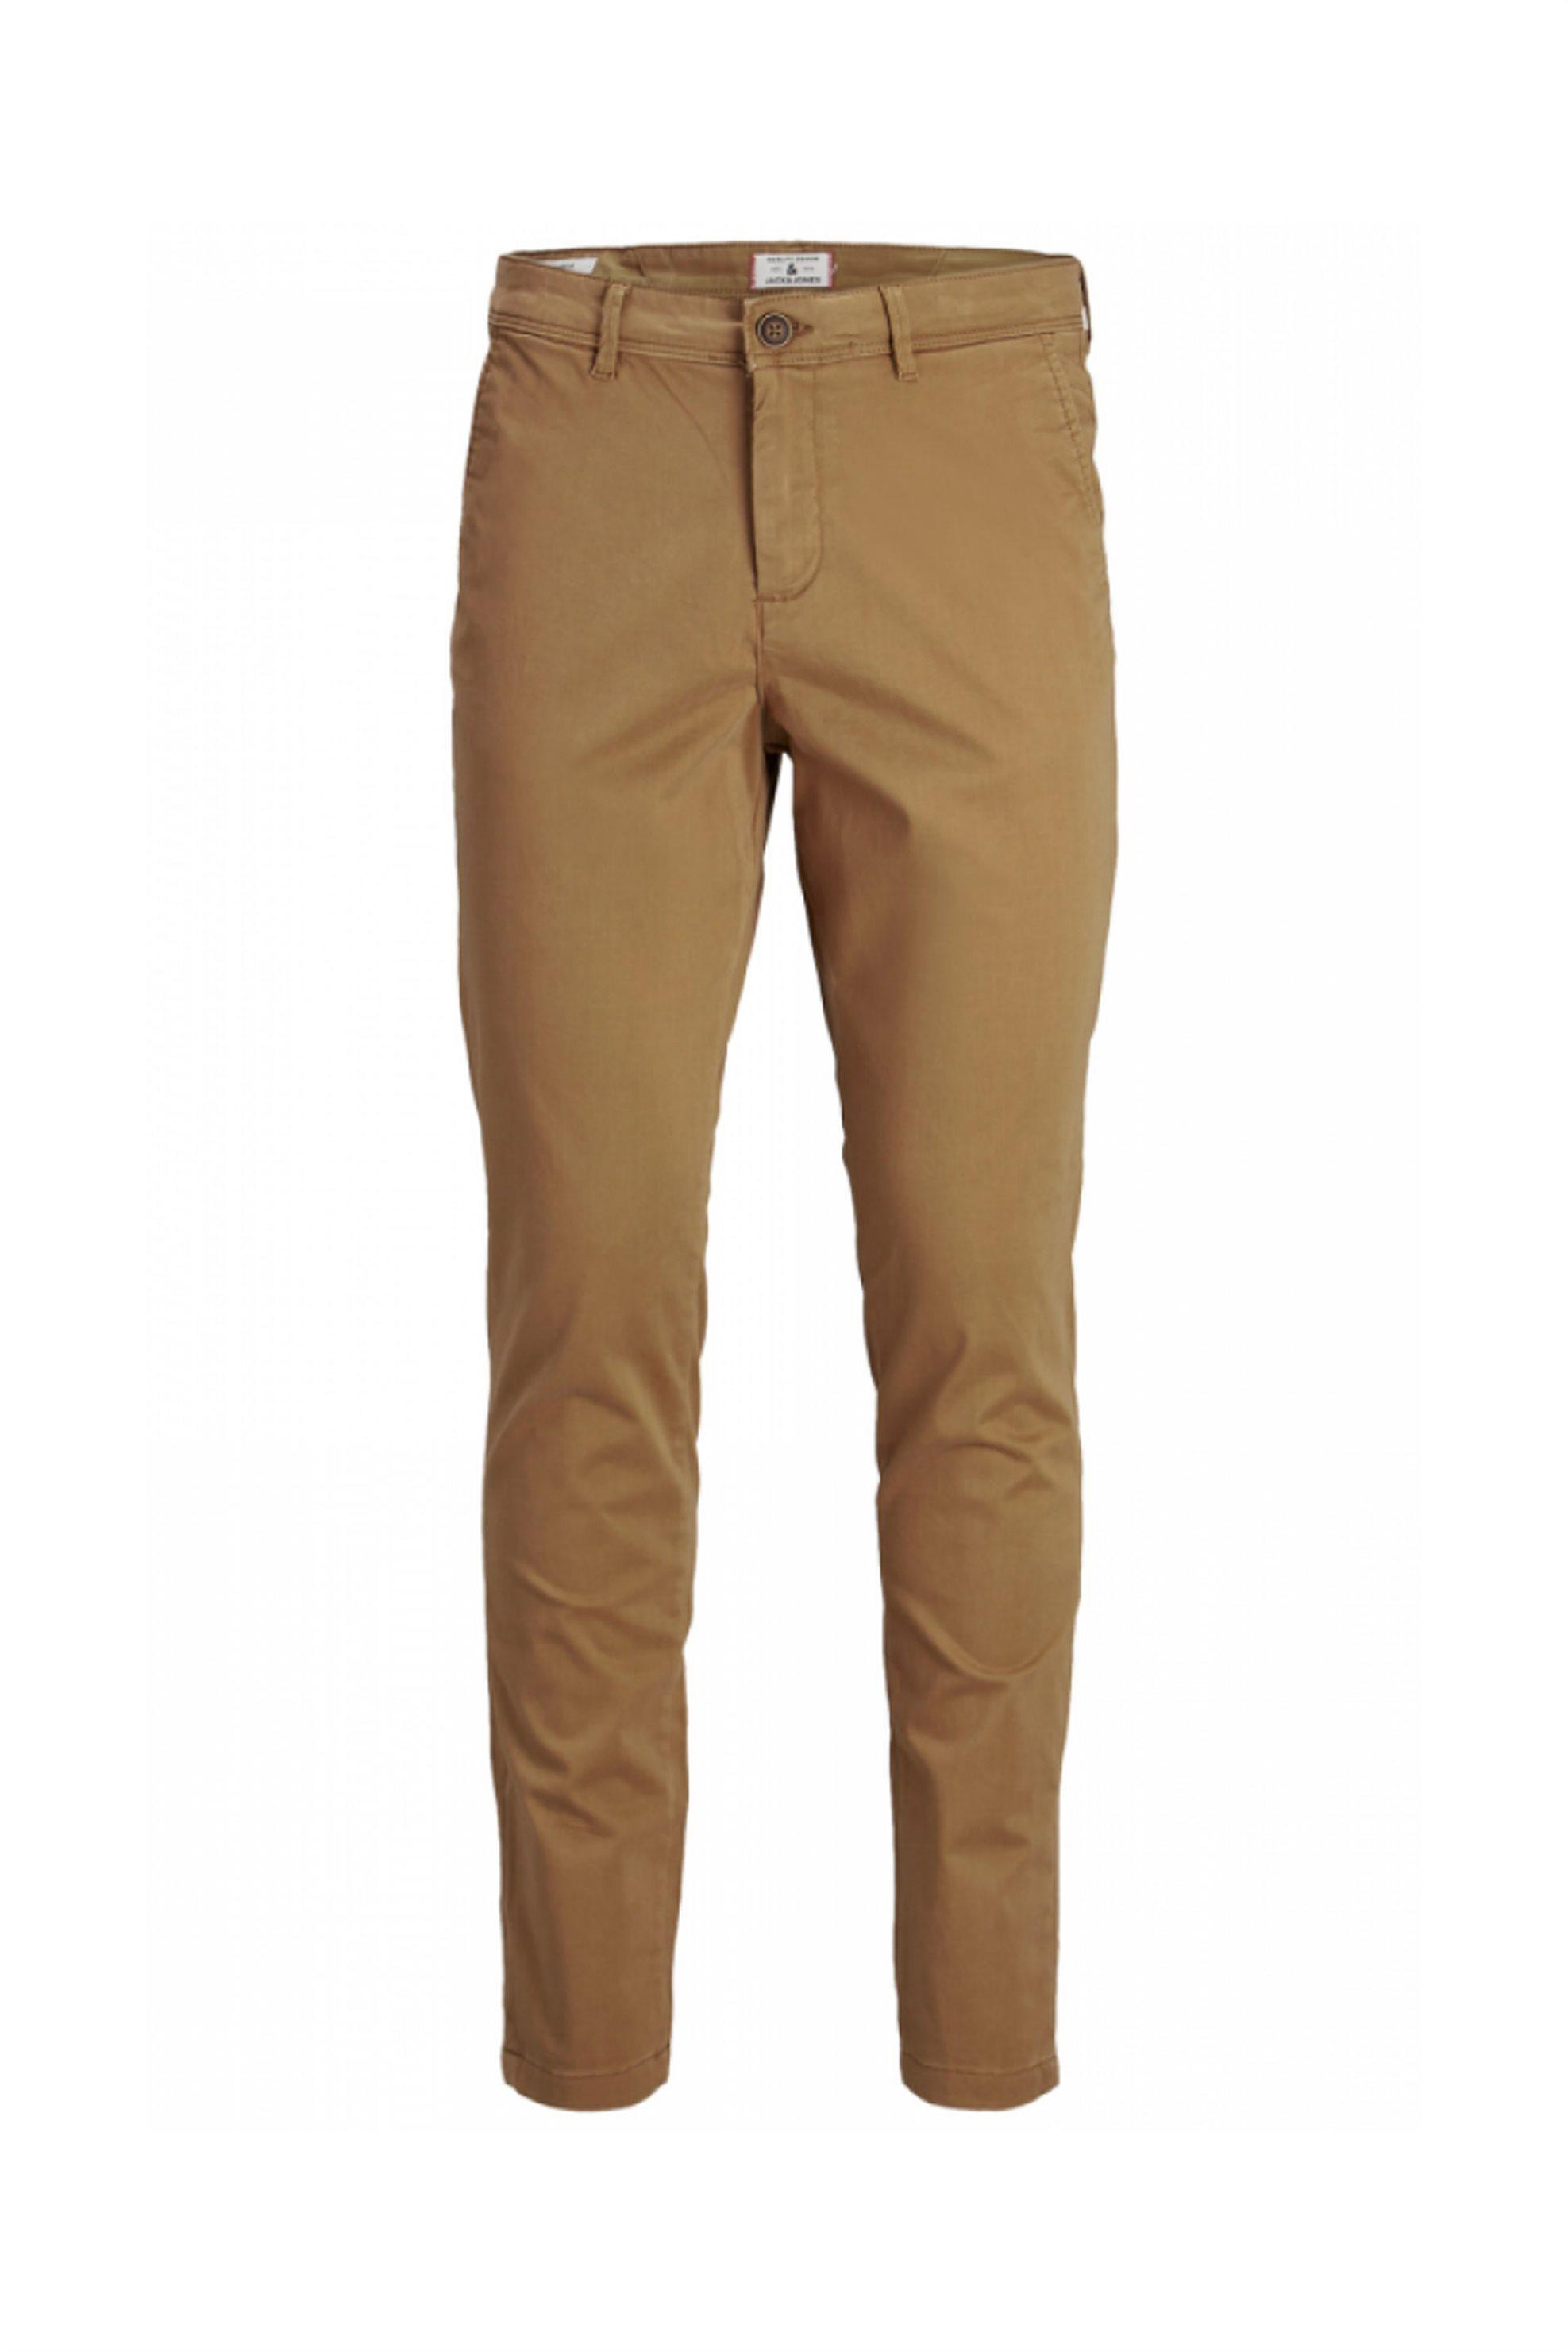 JACK & JONES ανδρικό chino παντελόνι μονόχρωμο - 12175969 - Μπεζ